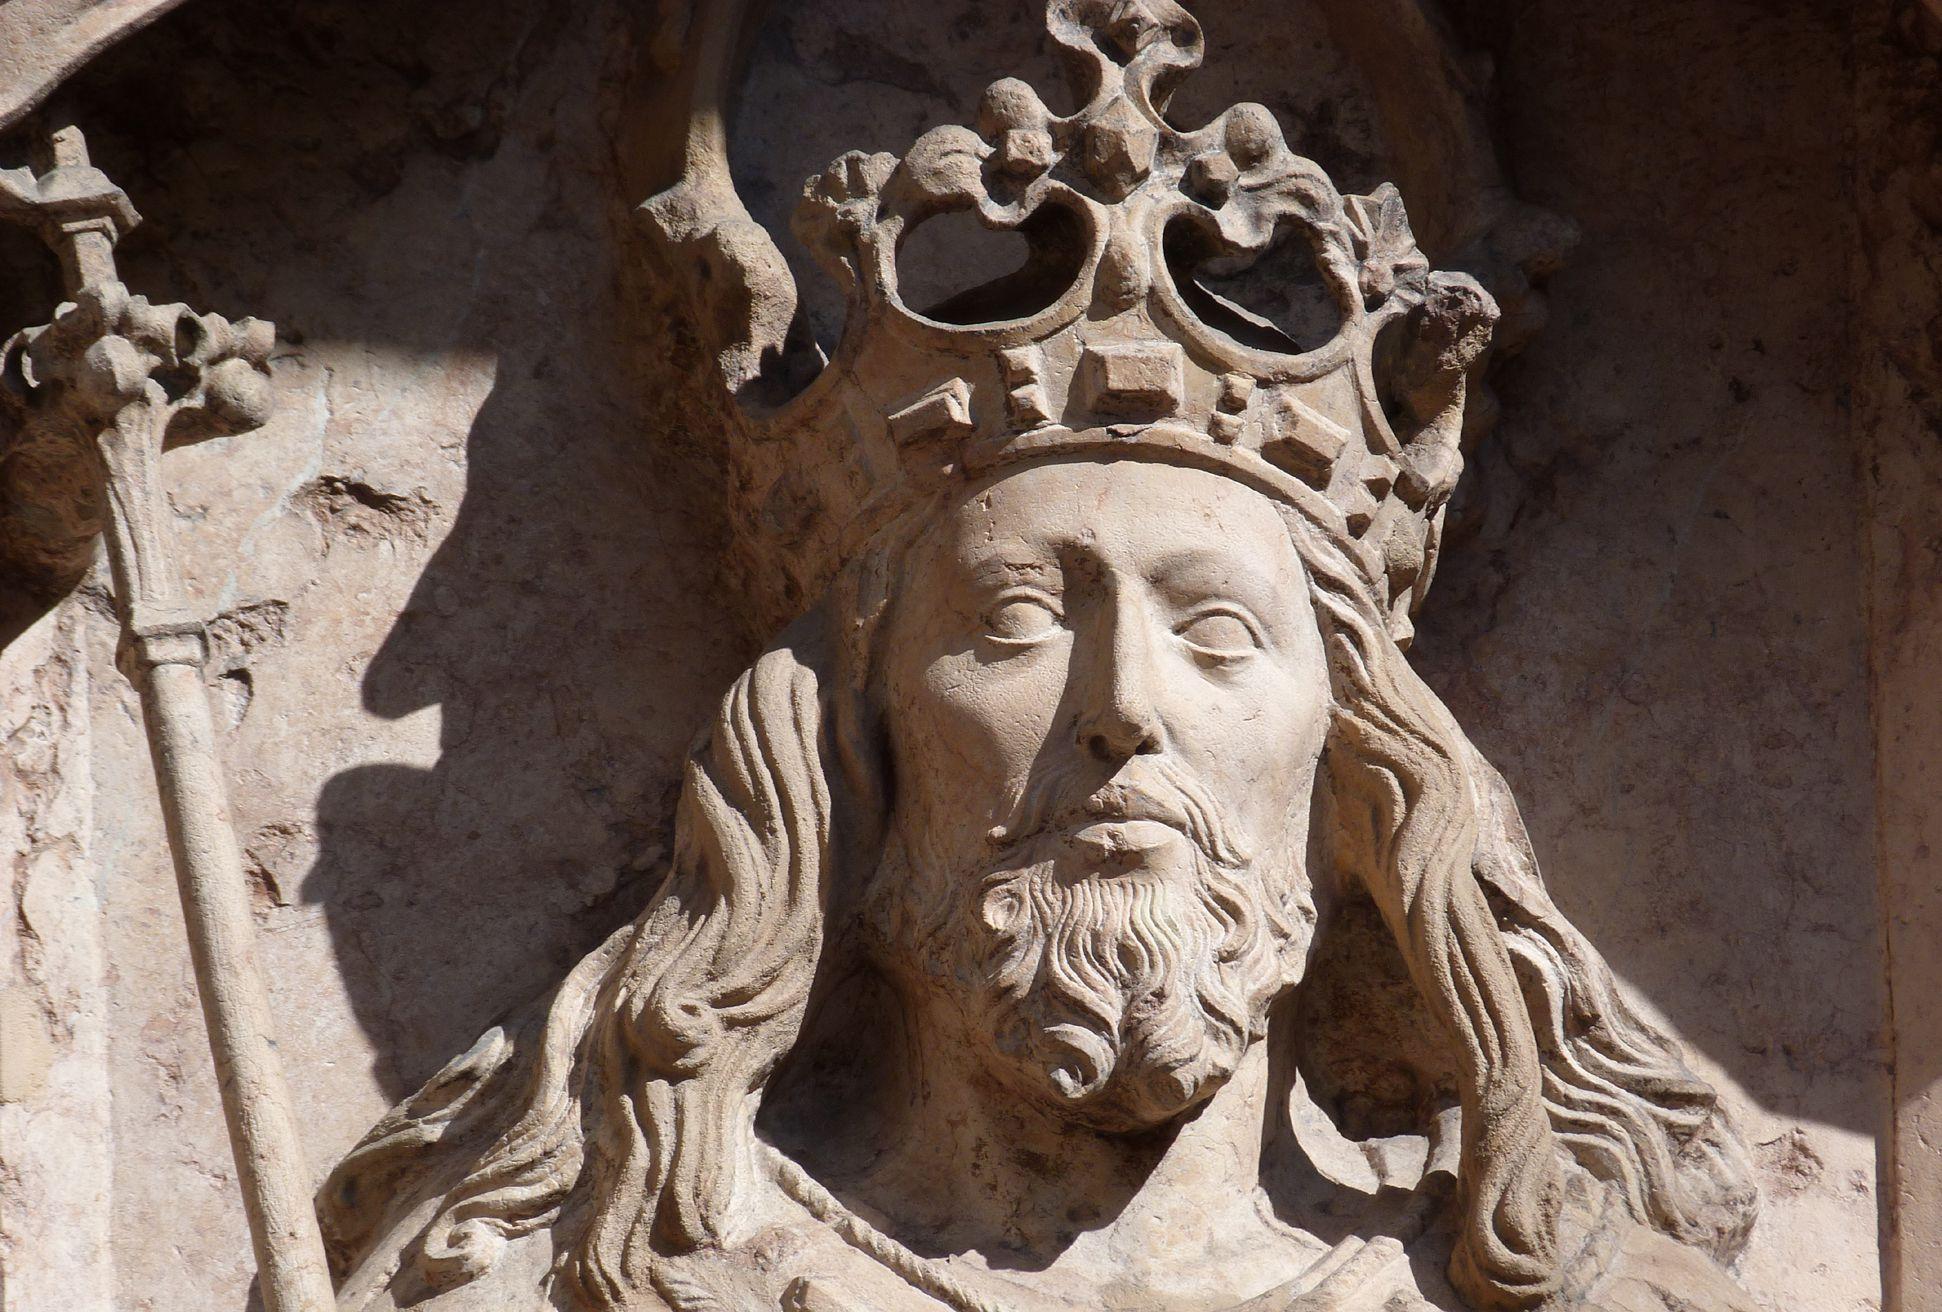 Epitaph of Kunz Horn Christ, head